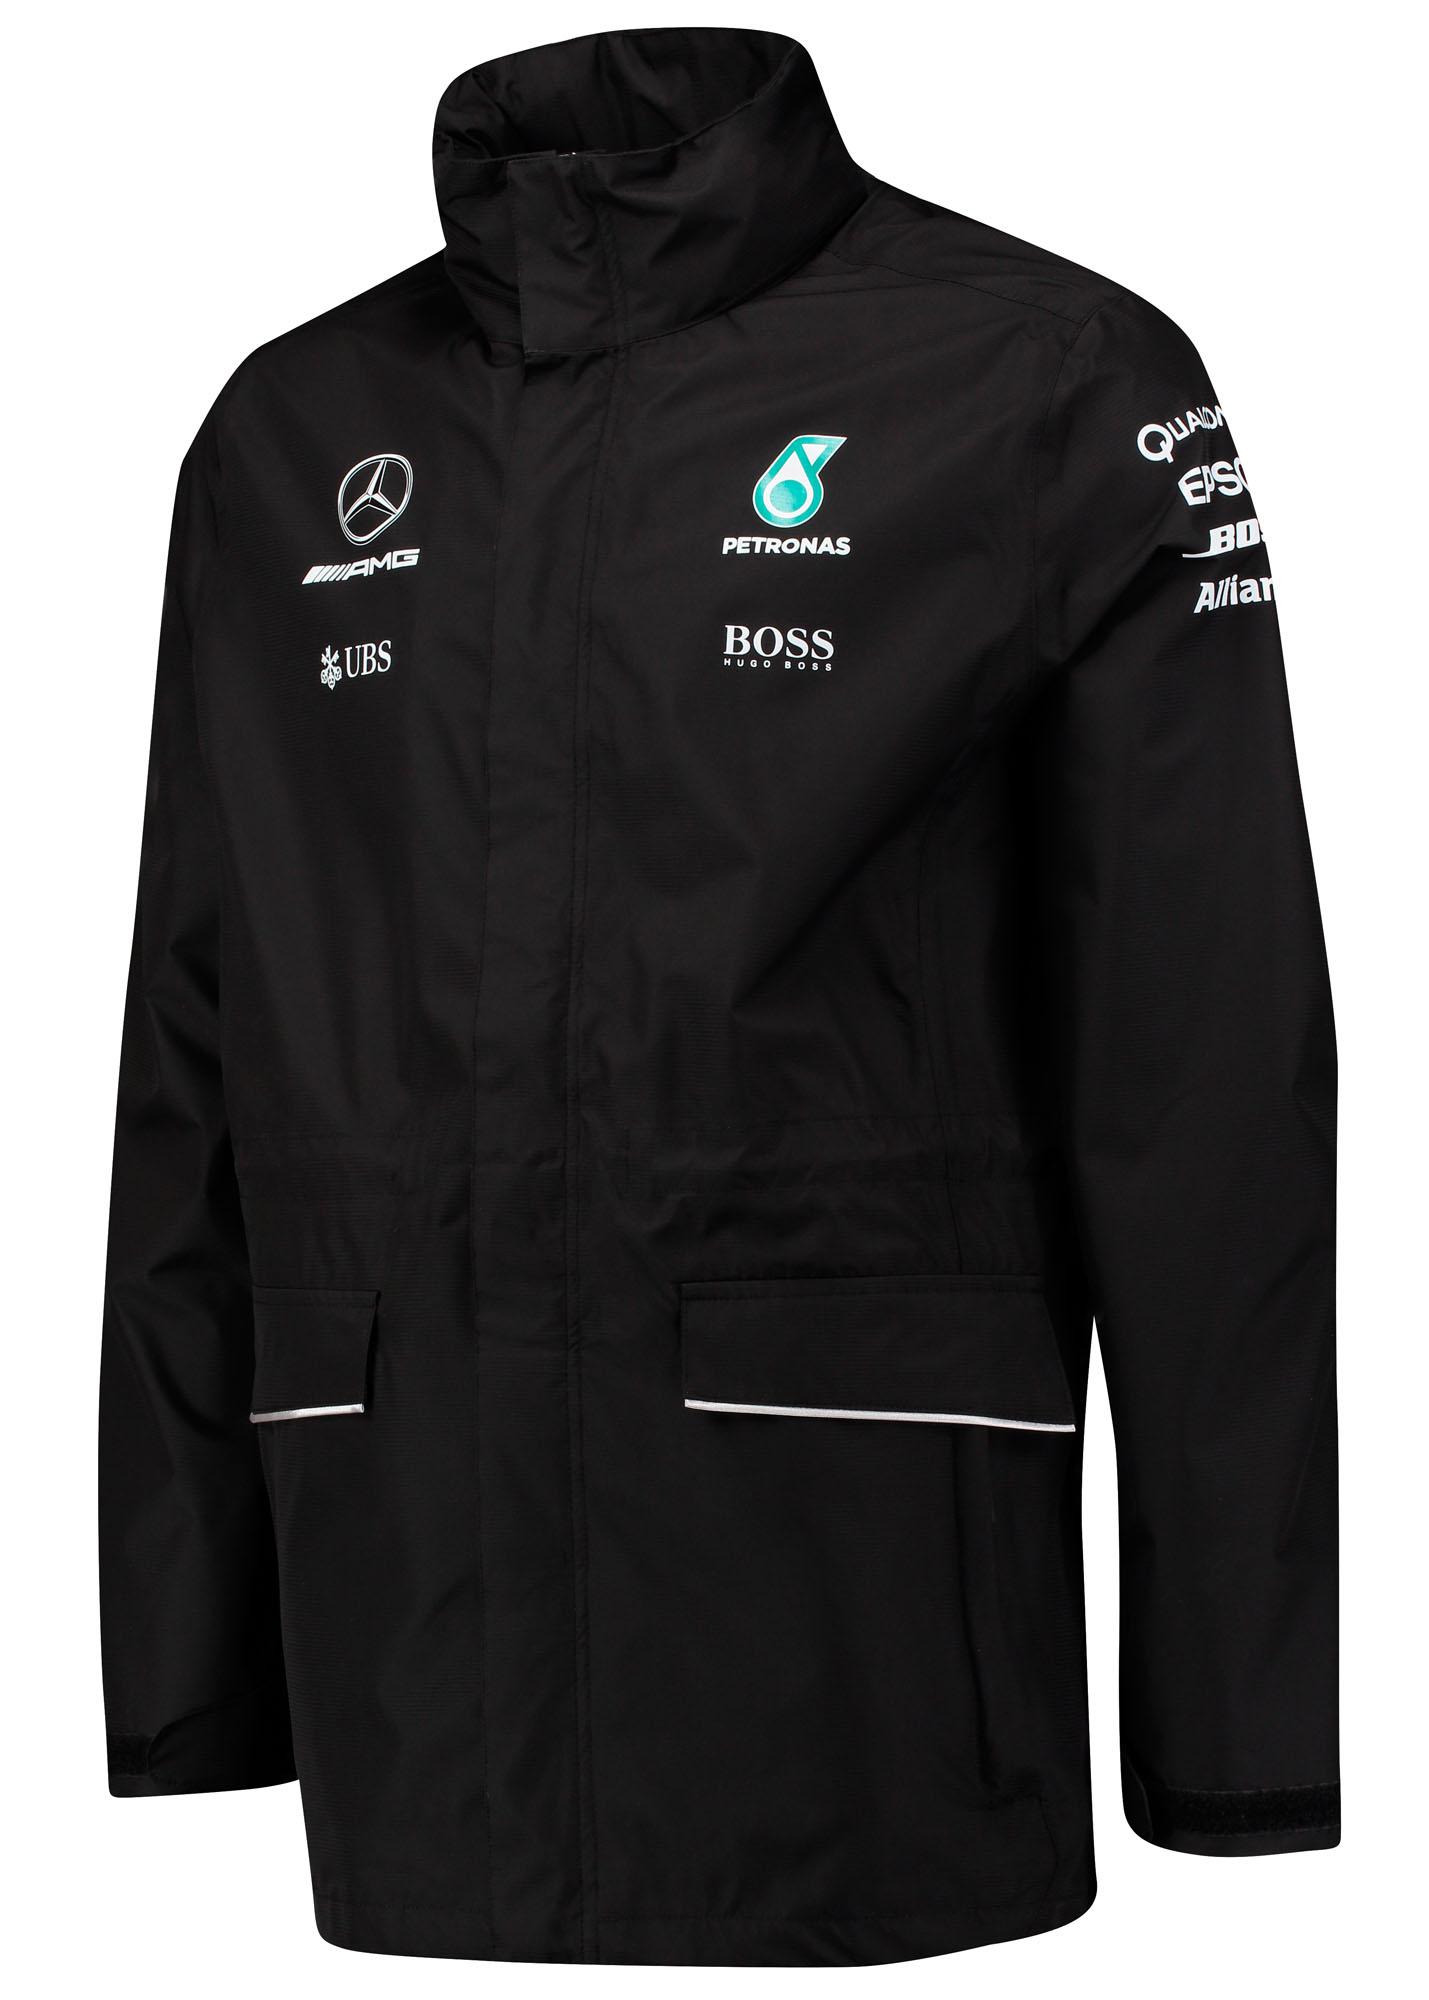 2017 Mercedes Amg F1 Lewis Hamilton Formula 1 Team Rain Jacket Coat